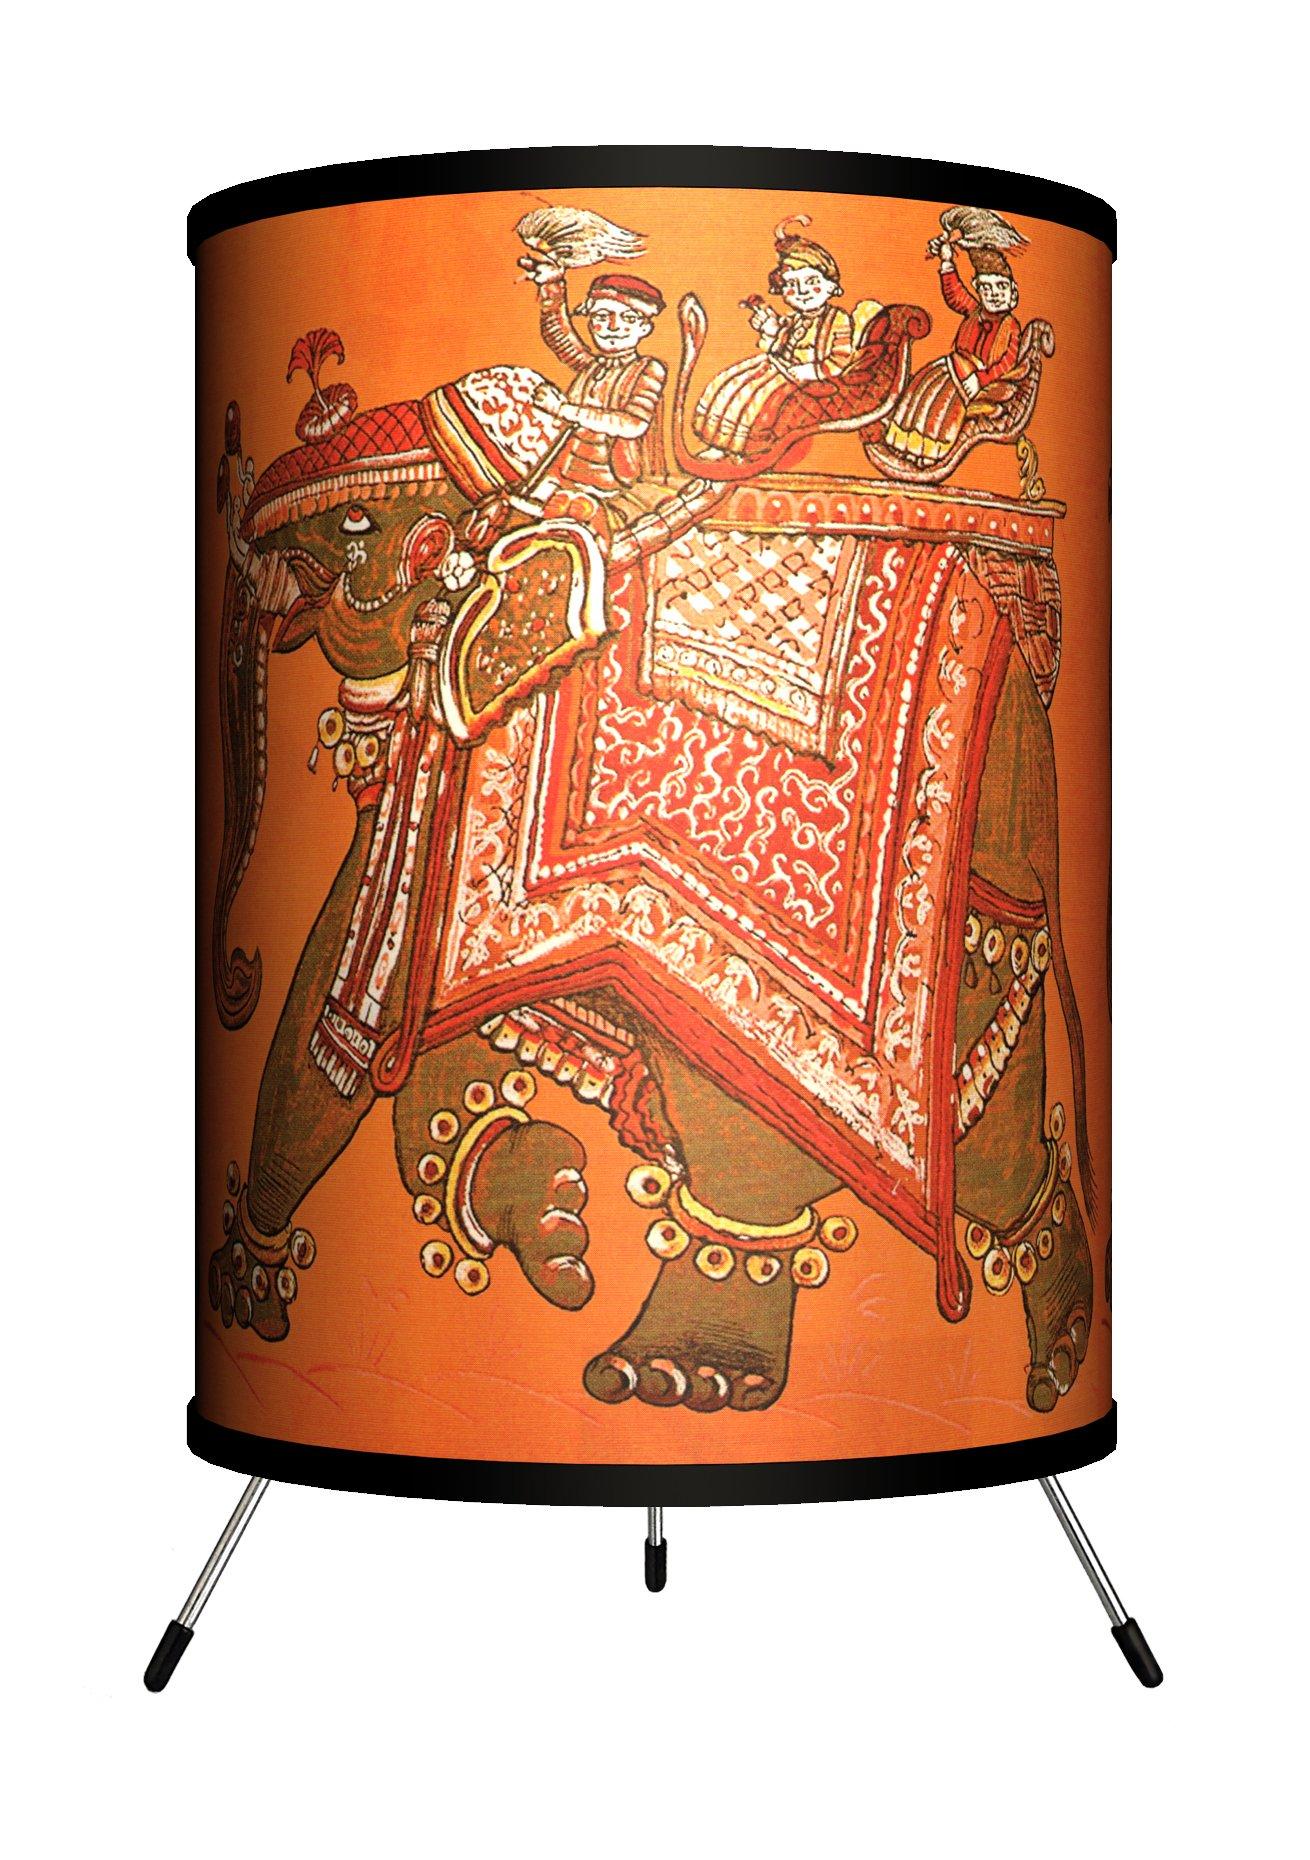 Lamp-In-A-Box TRI-VAR-INDIA Various - India Design Tripod Lamp, 8'' x 8'' x 14''